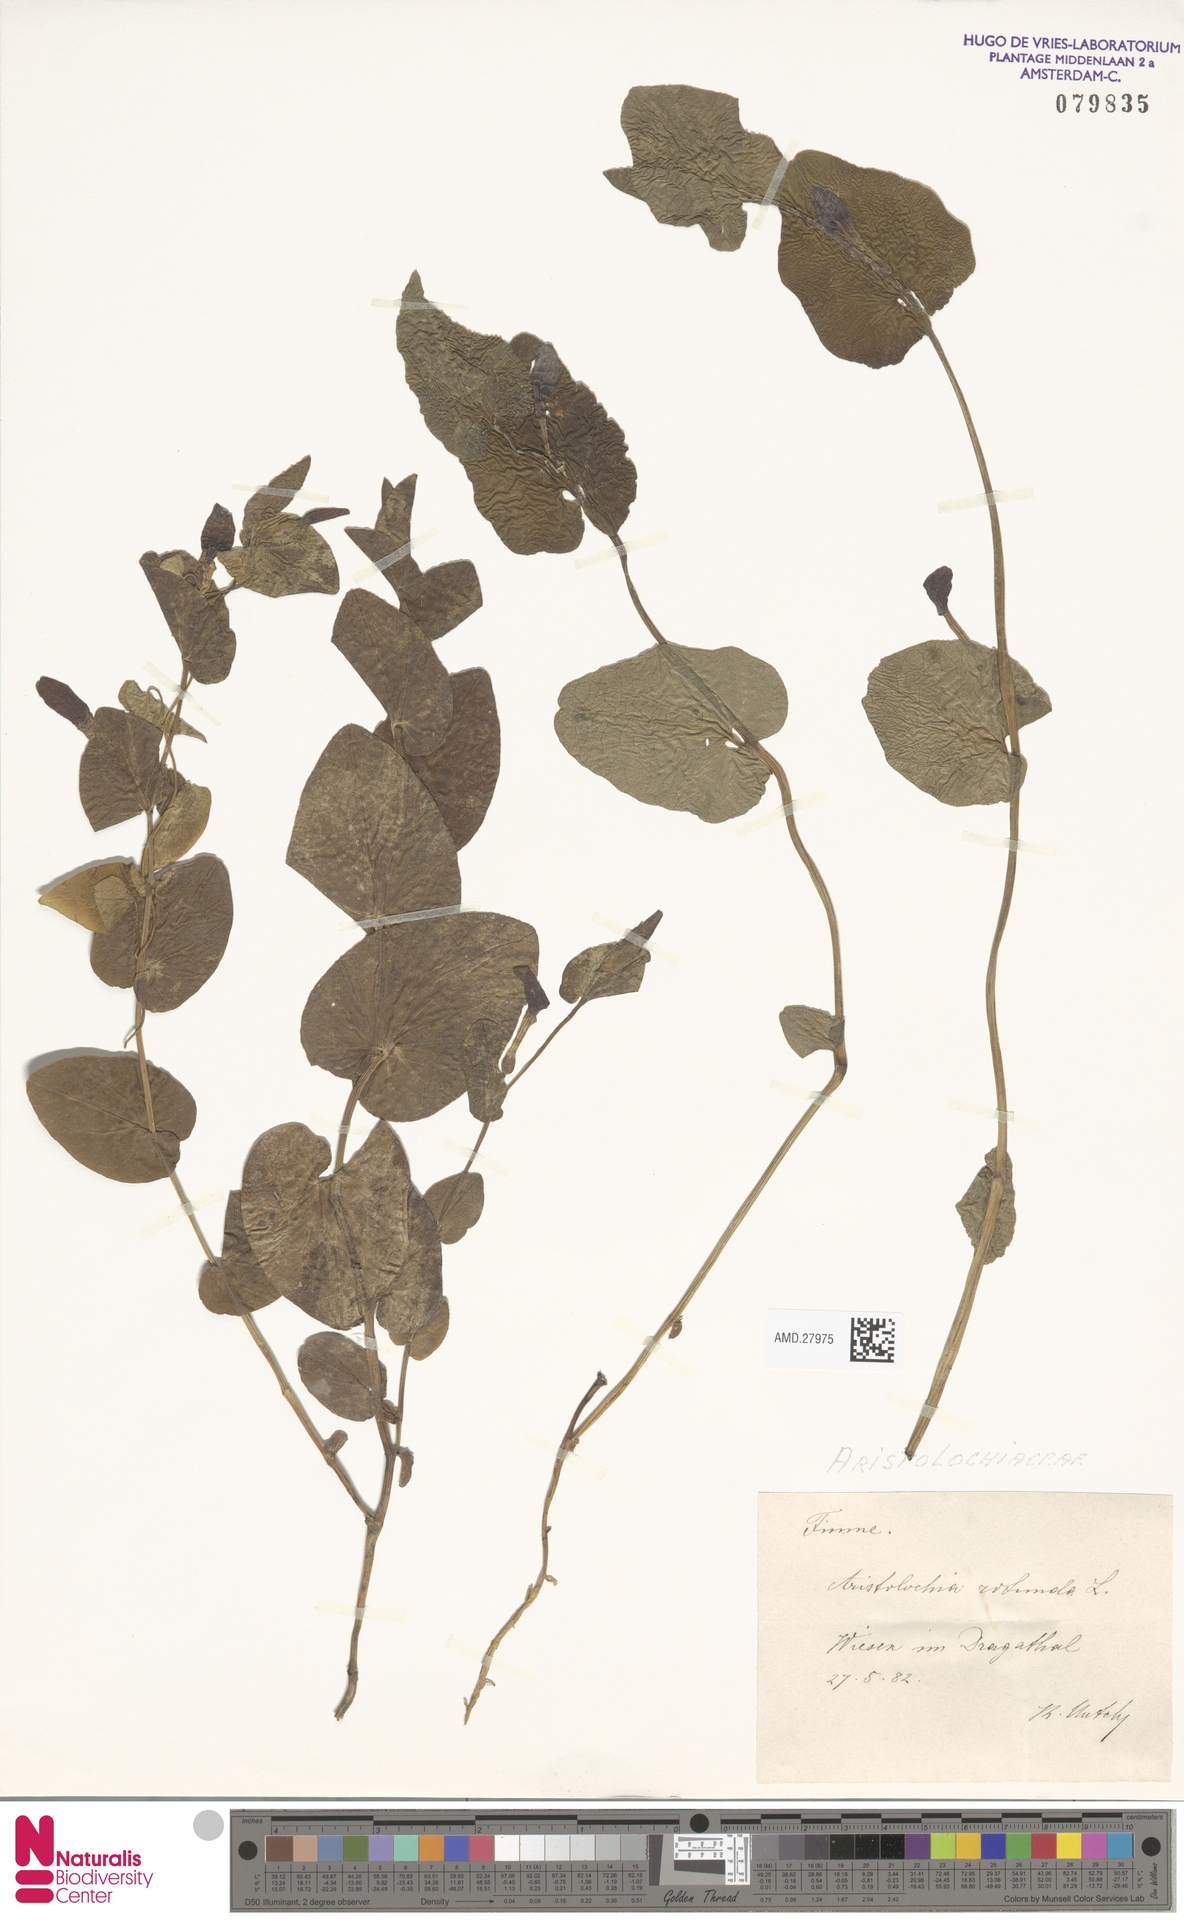 AMD.27975 | Aristolochia rotunda L.